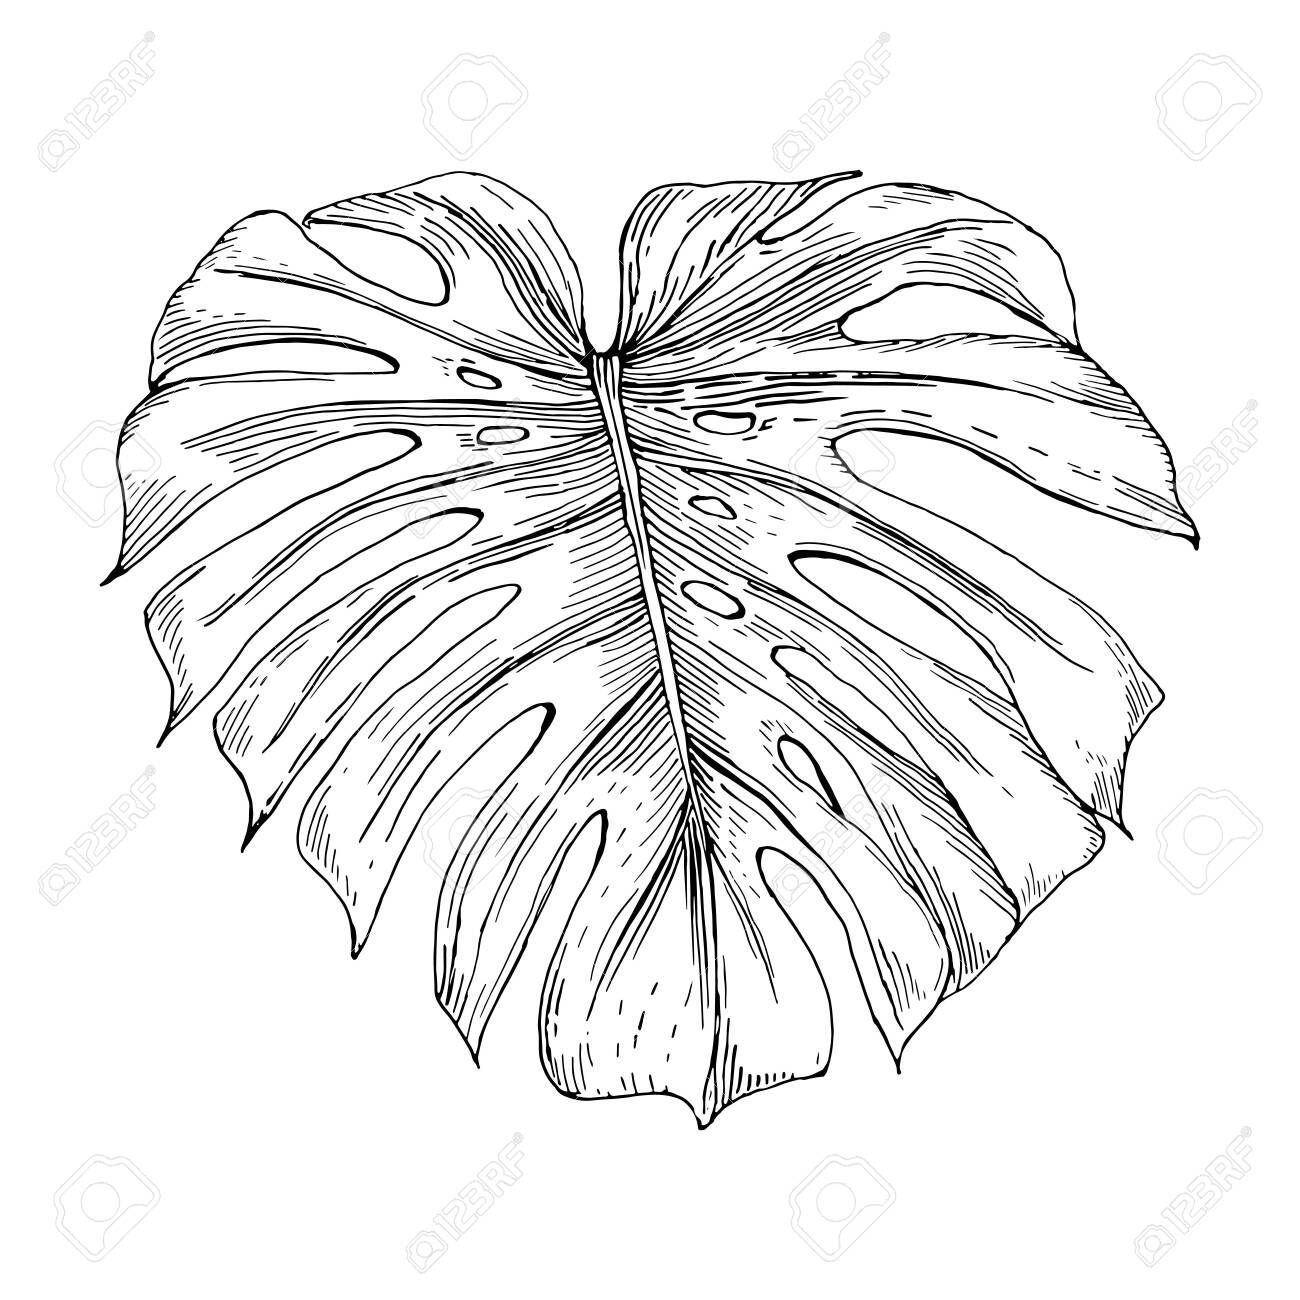 Vector vintage illustration of monstera leaf isolated on white. Hand drawn botan...#botan #drawn #hand #illustration #isolated #leaf #monstera #vector #vintage #white